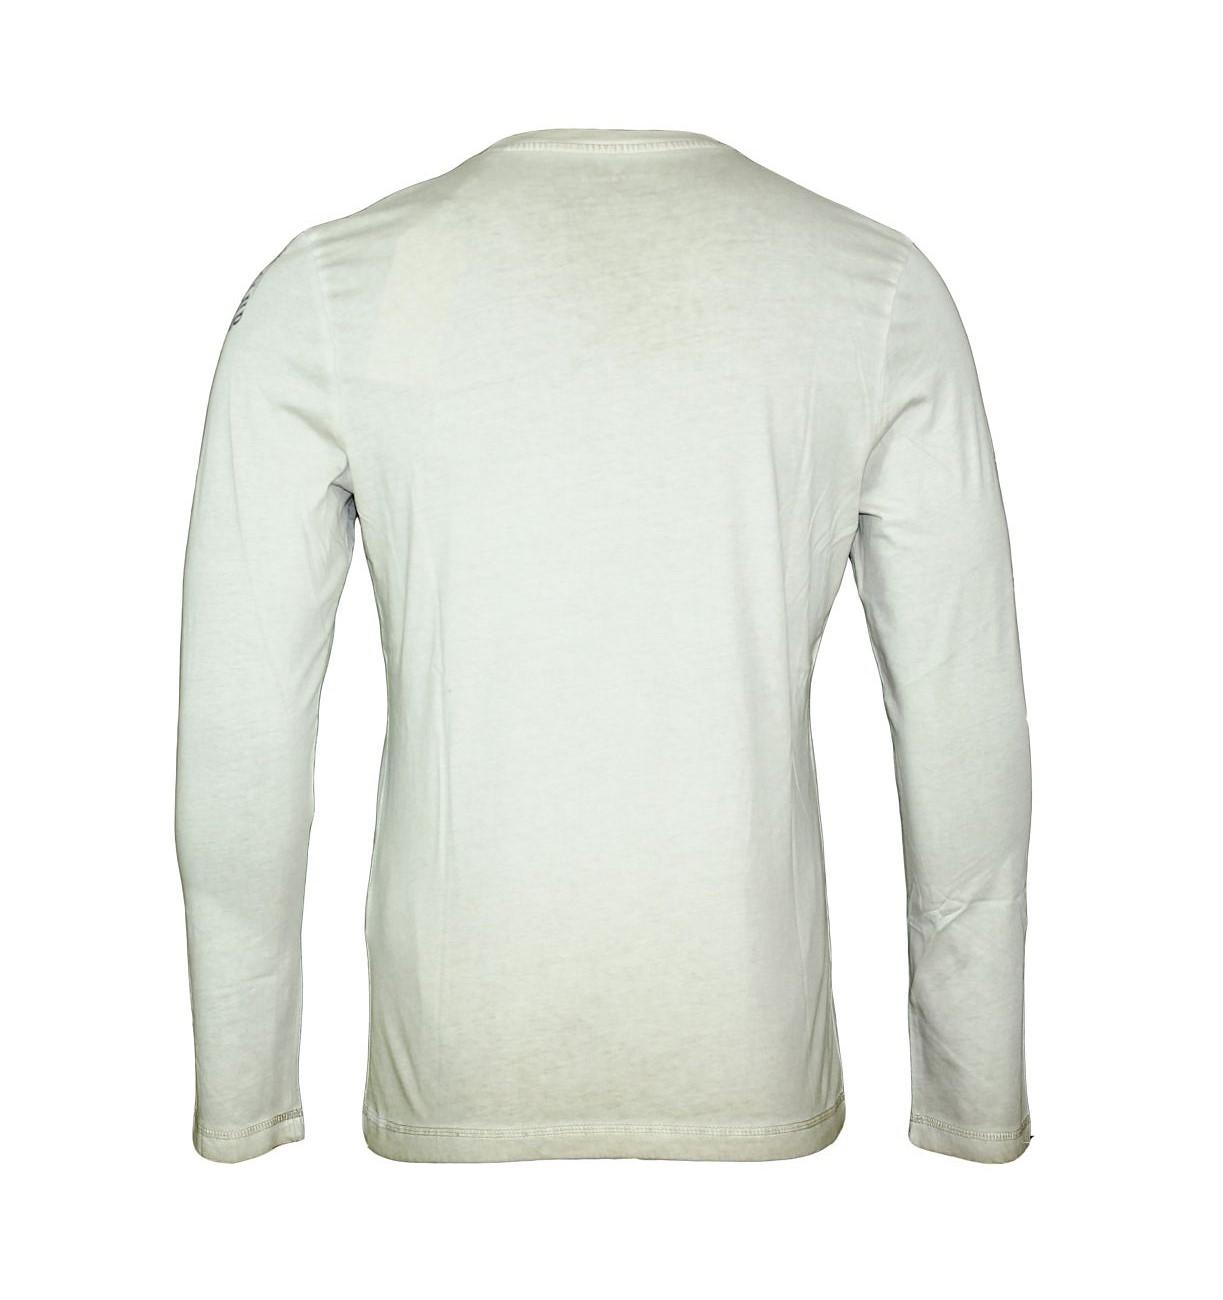 Tom Tailor Shirt Pullover Longsleeve Rib Neck Henley 1034074 9910 beige, creme